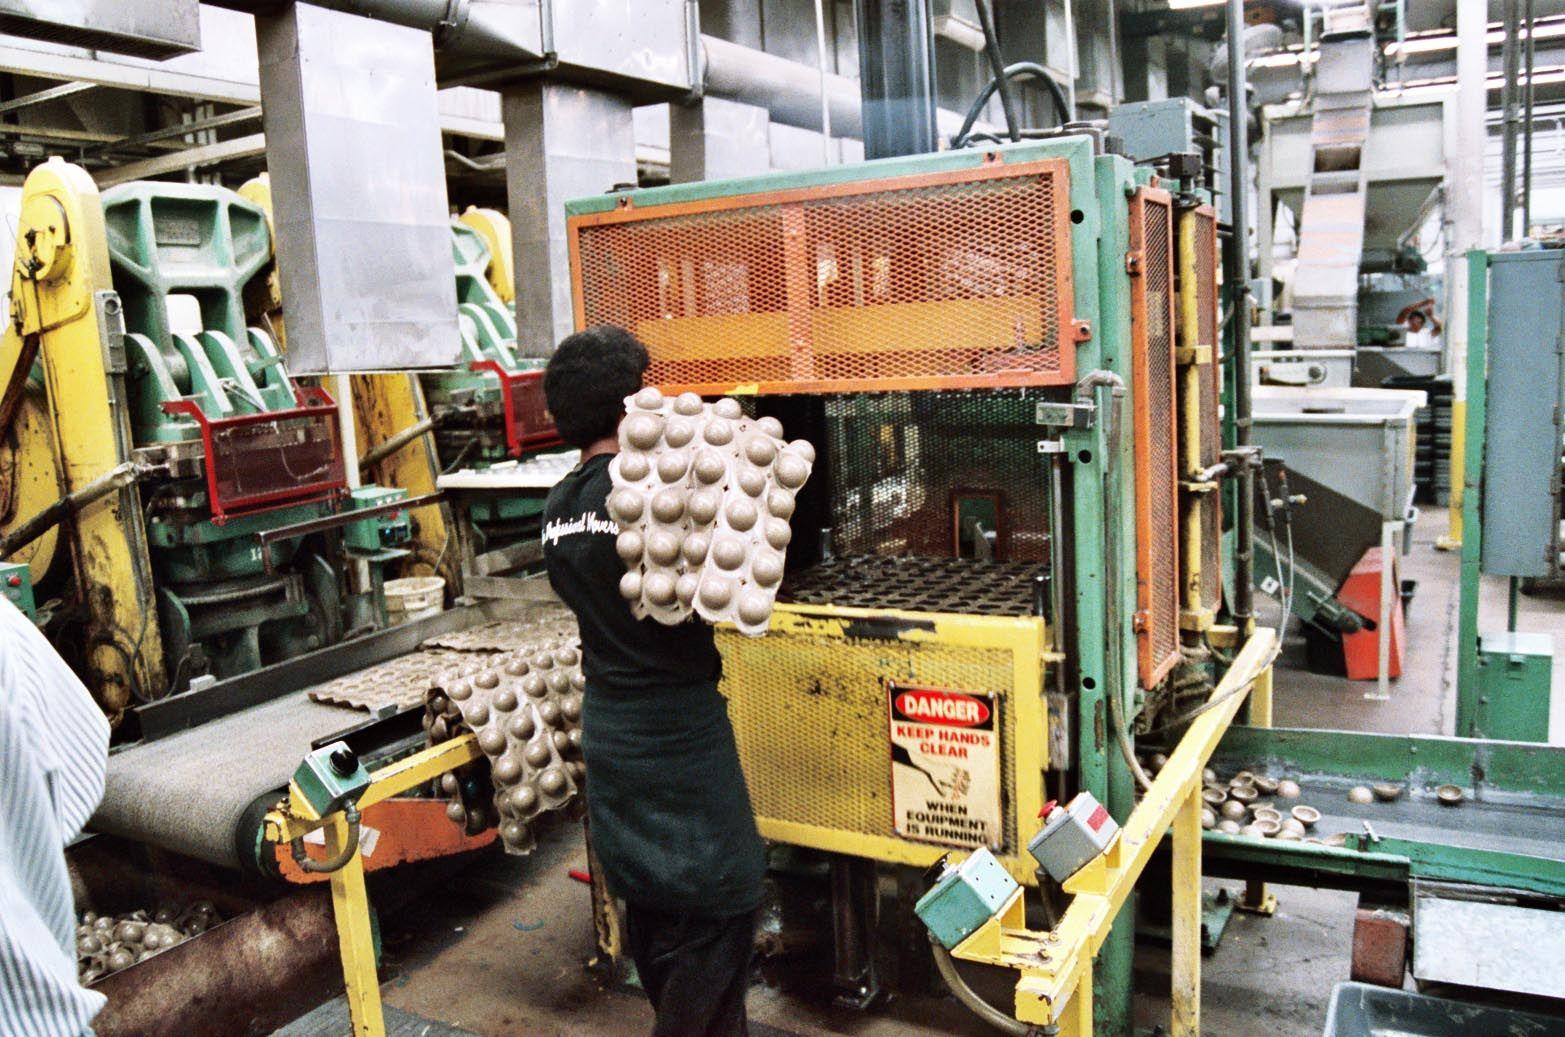 Penn Factory